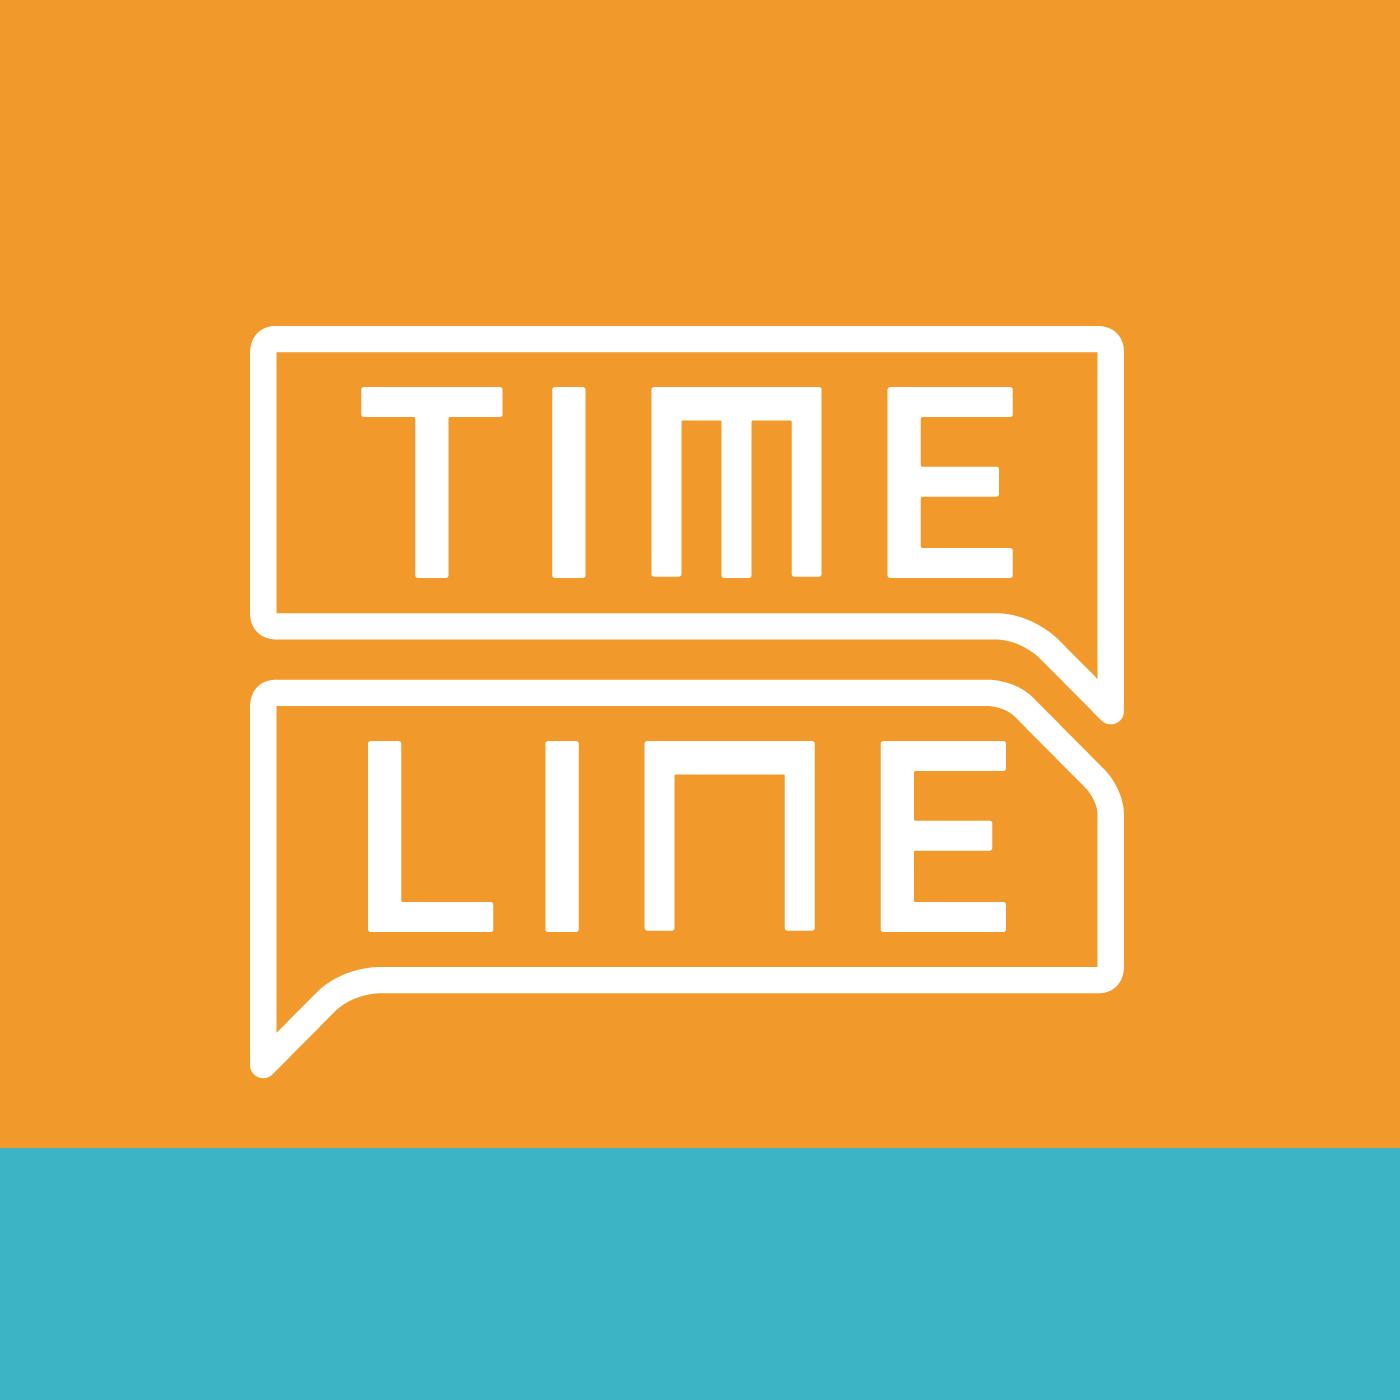 Timeline Gaúcha 27/06/2017